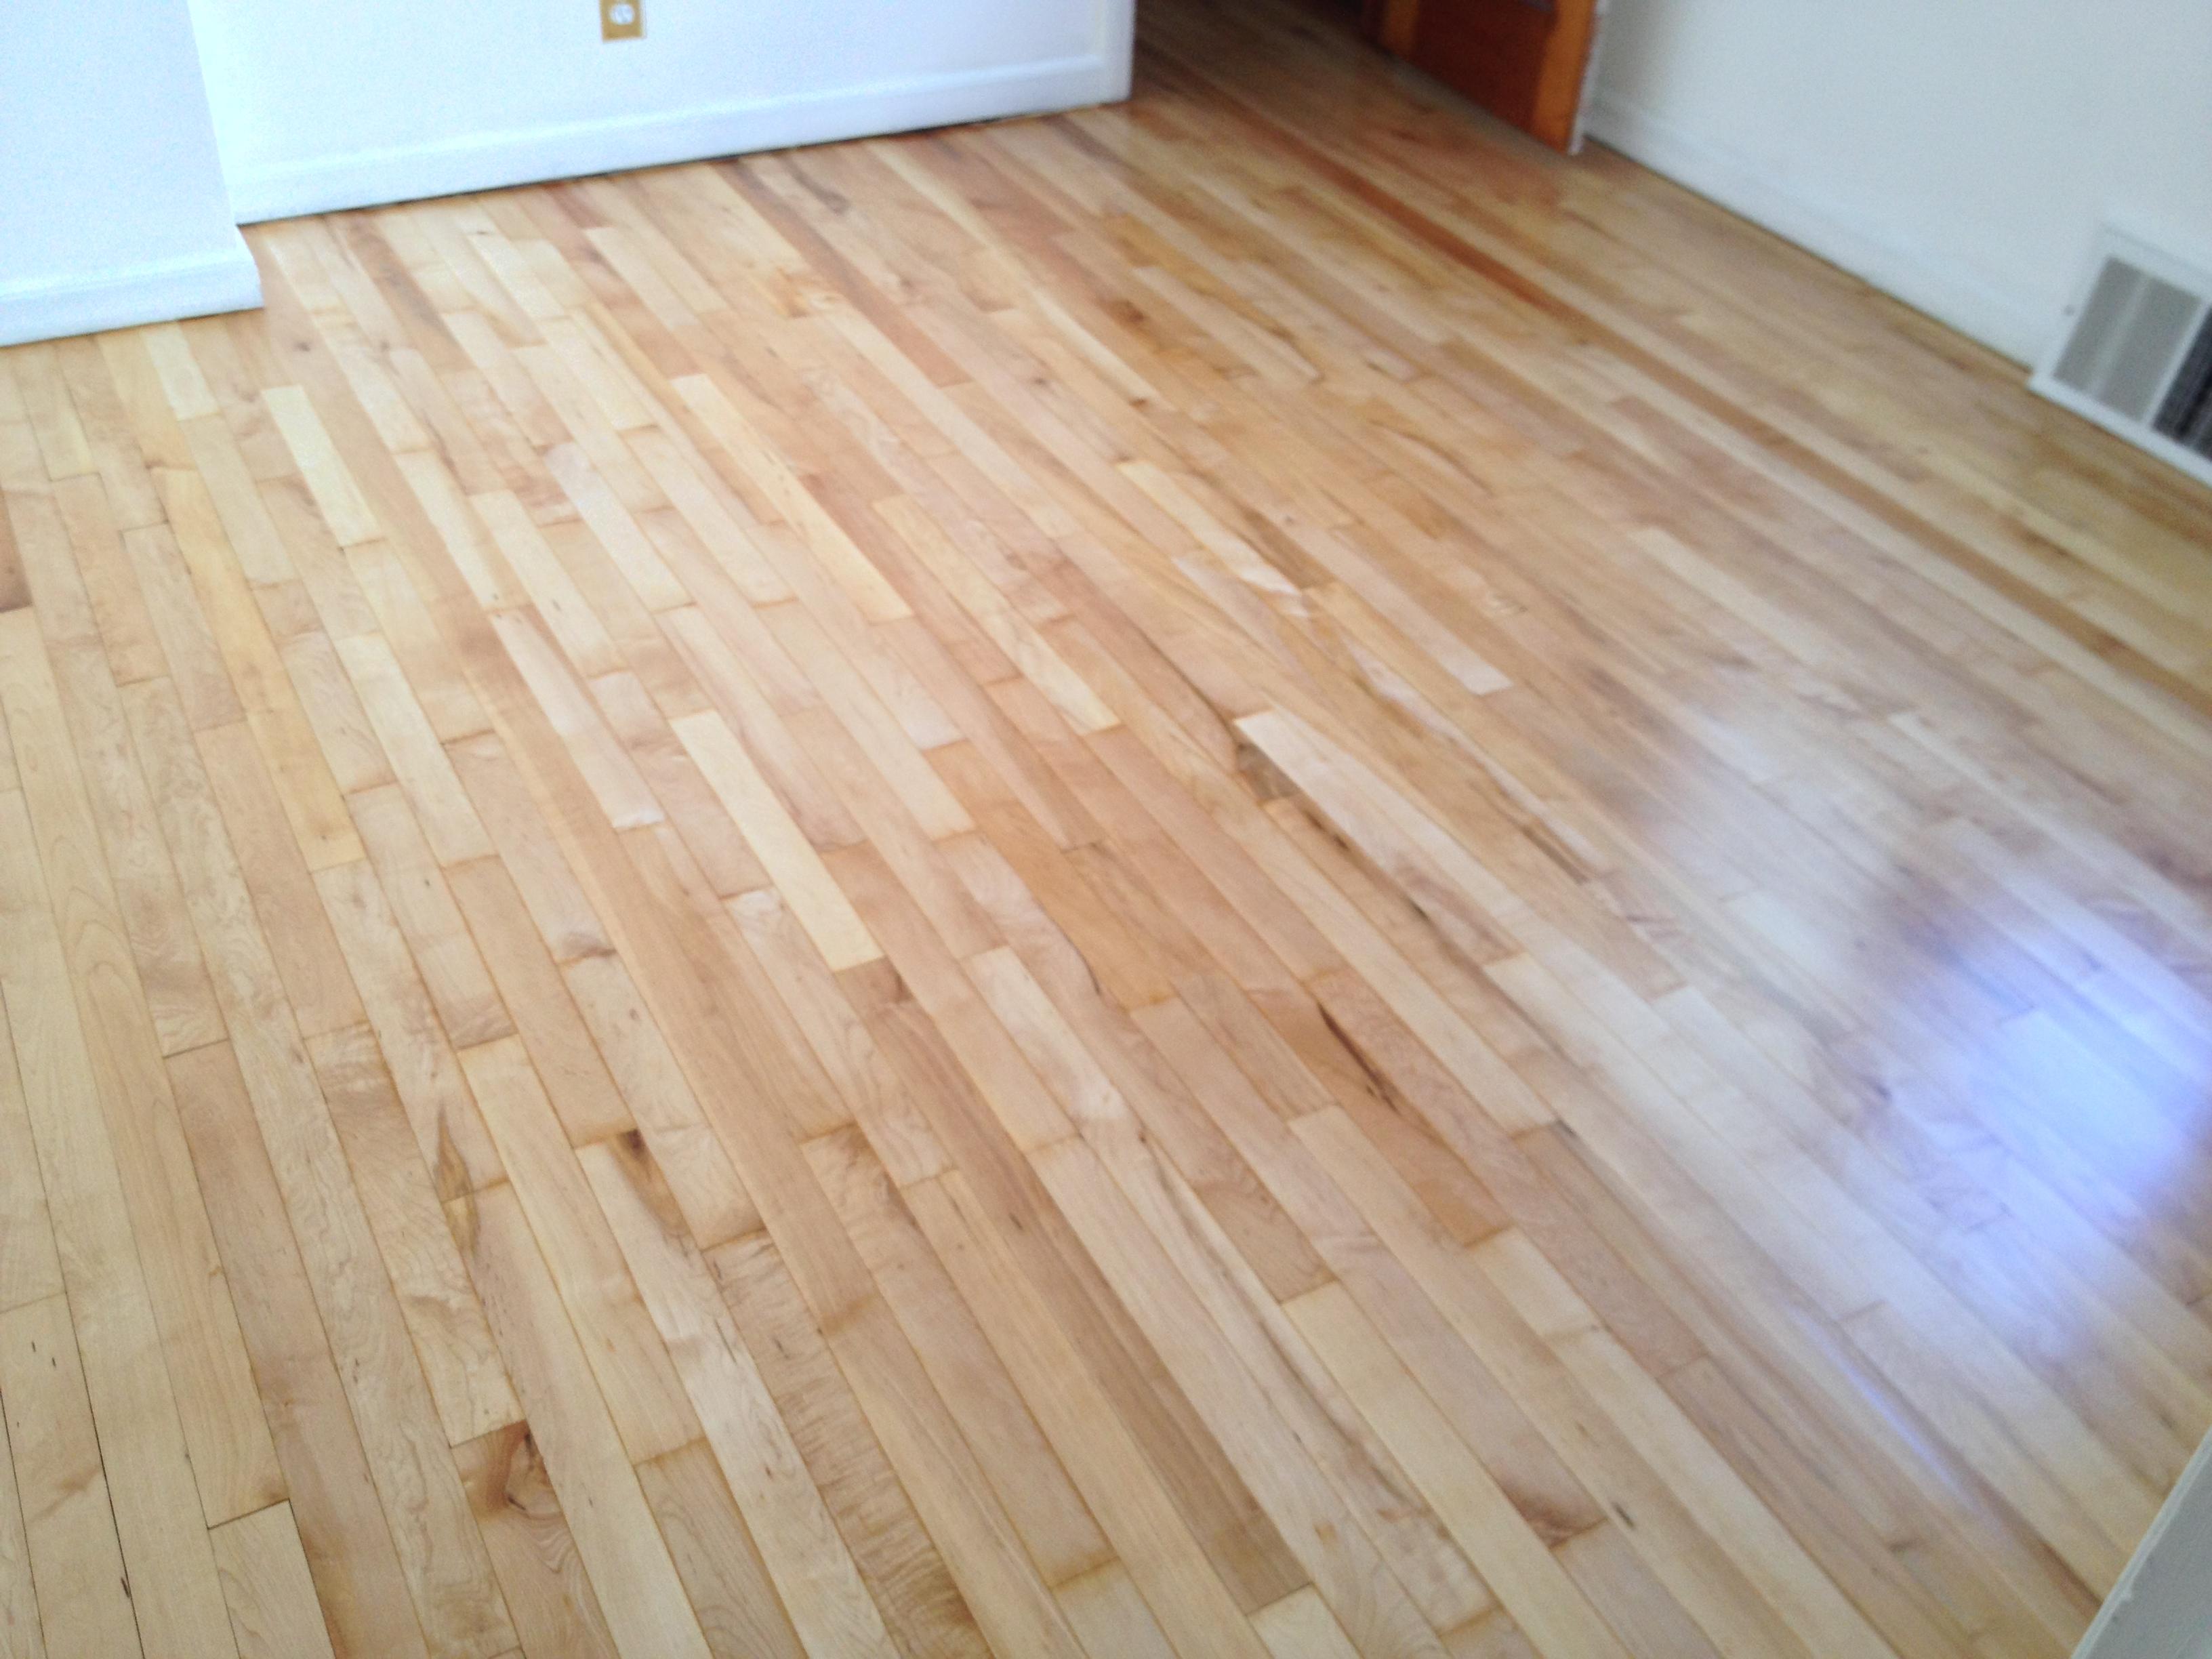 Introducing The New Go To Milwaukee Hardwood Floor Artisan